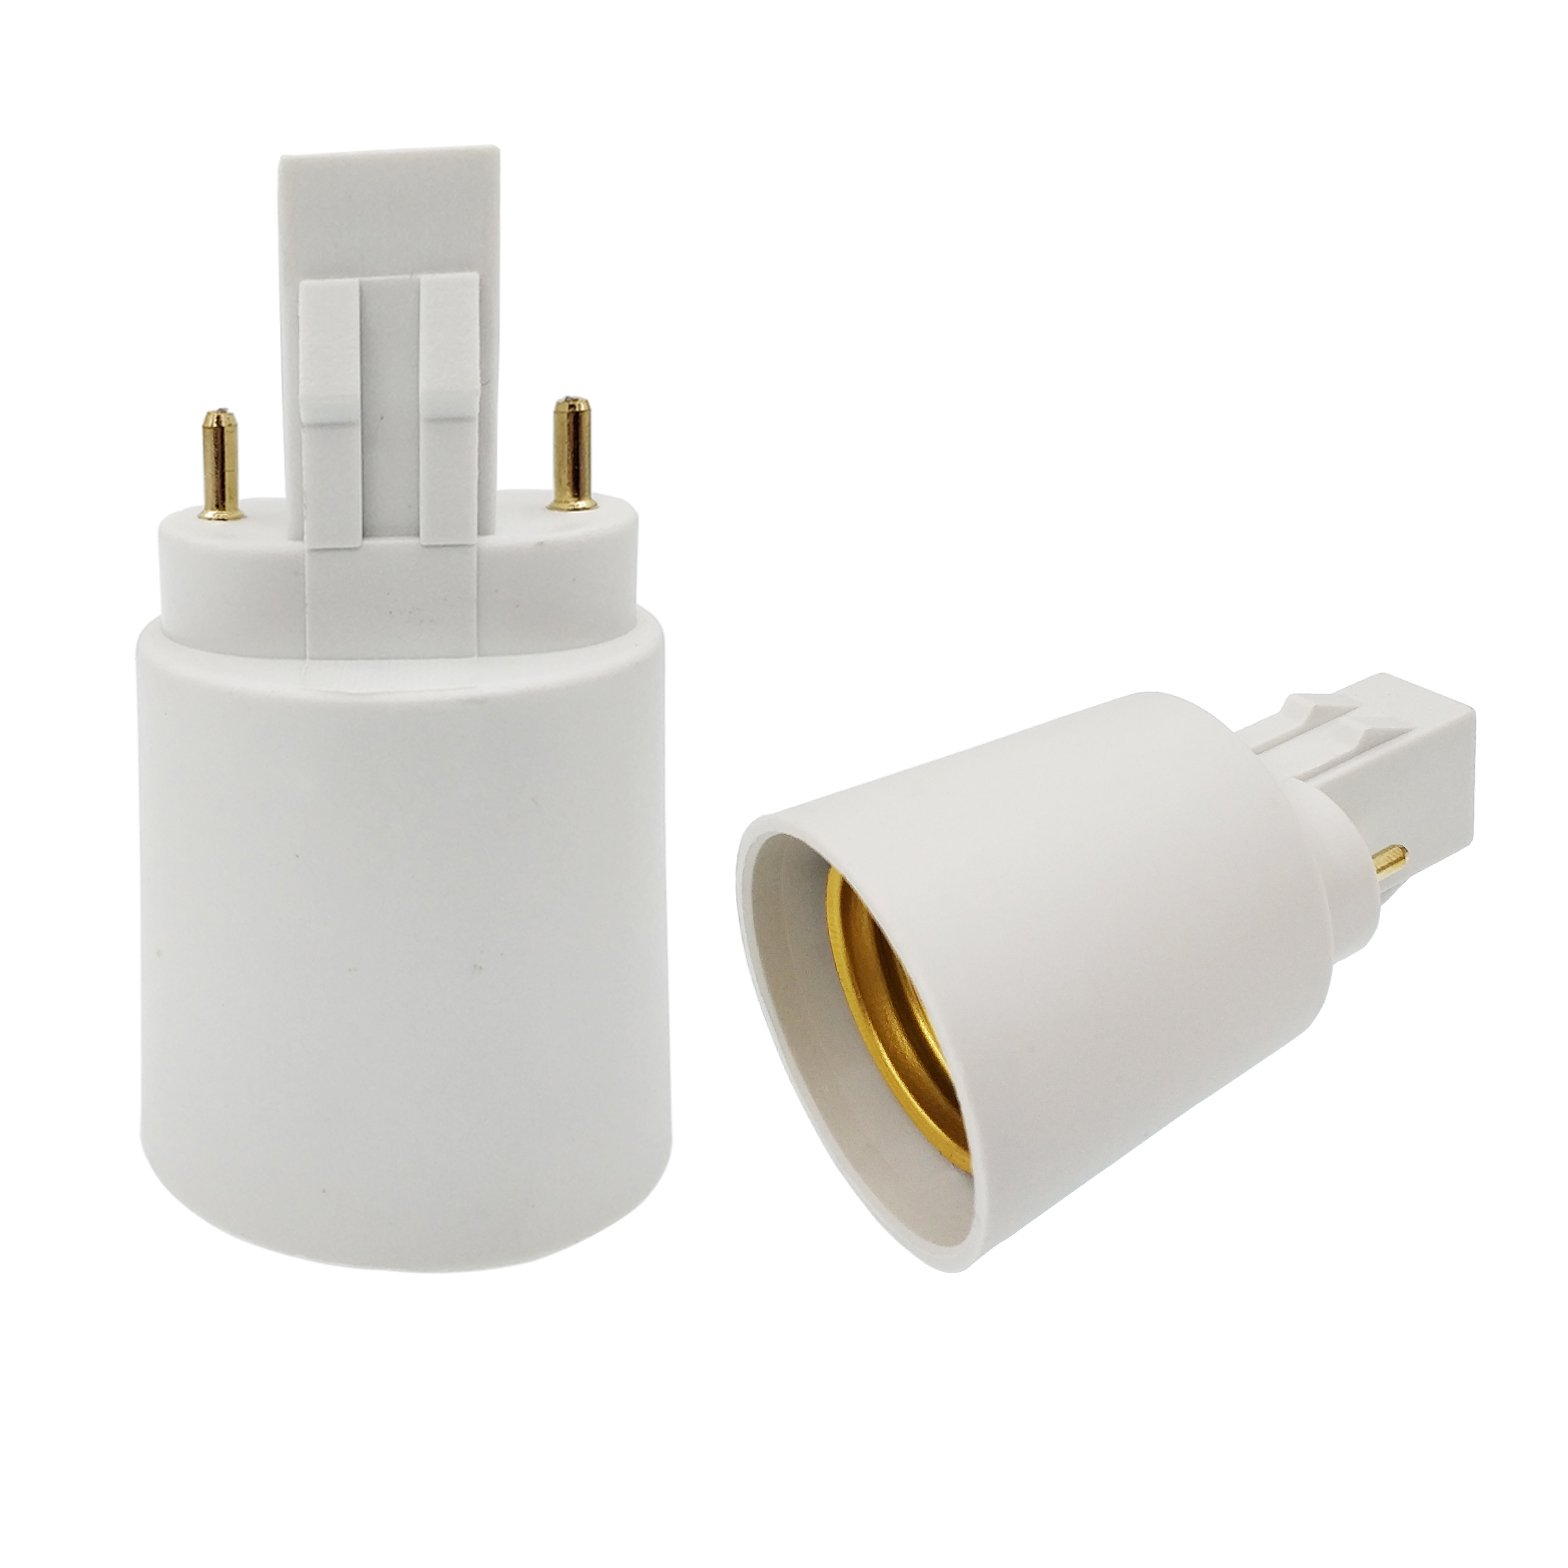 E-Simpo 10pcs GX23 to E26 Light Socket Adapter GX23 to E26/e27 Lamp Base Converter, 2Pin Light Sockets Adapter Double Tab.2P in Parallel (10-Pack)